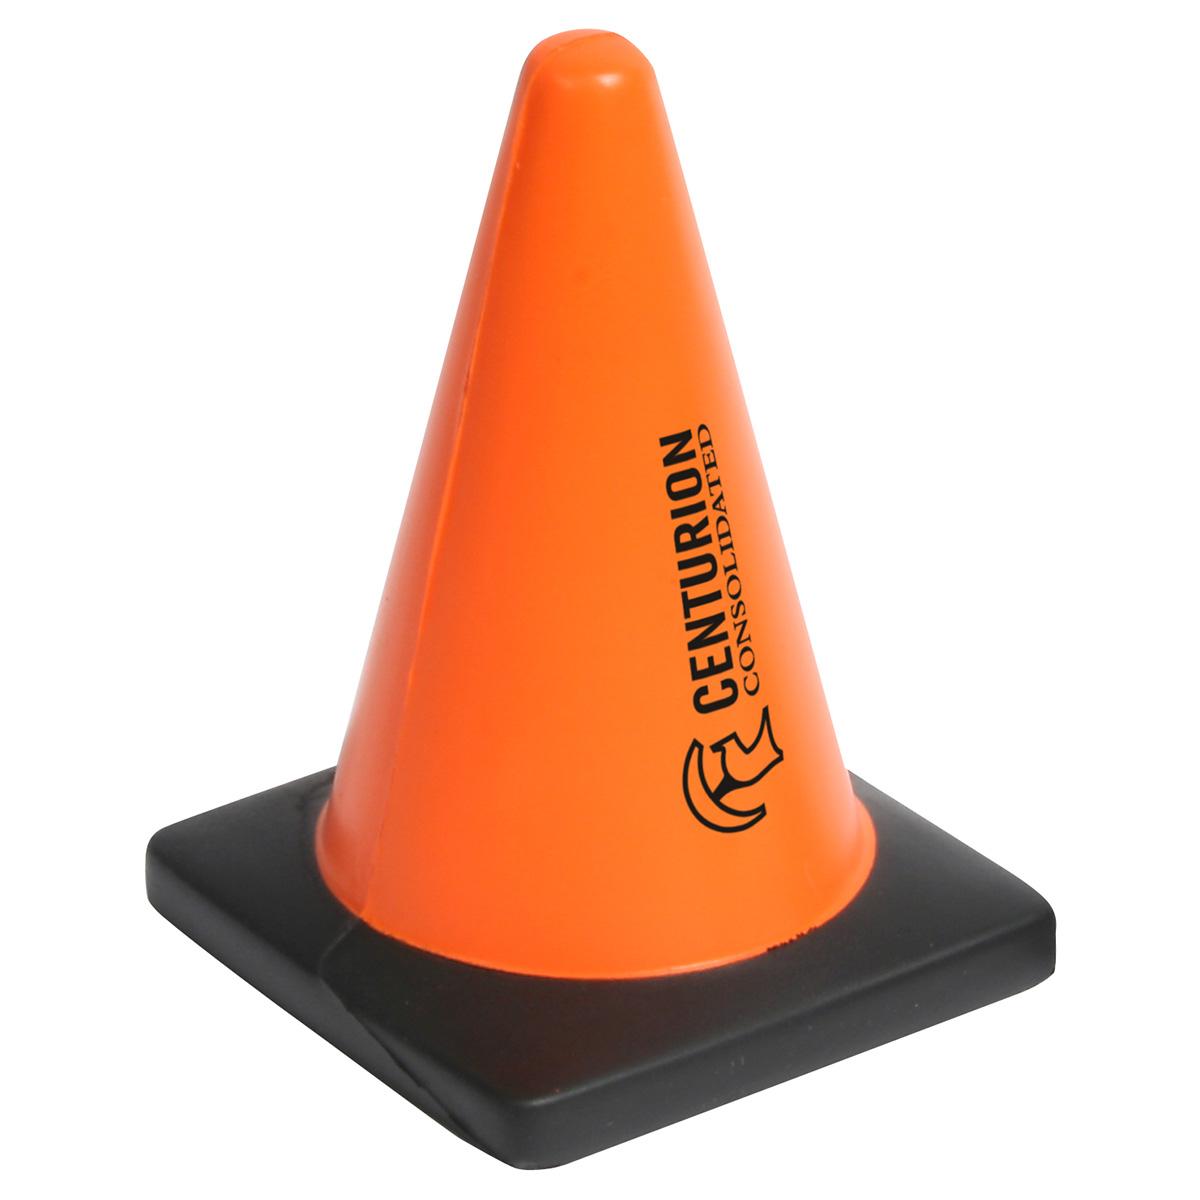 Construction Cone Stress Reliever, LCN-CC04, 1 Colour Imprint